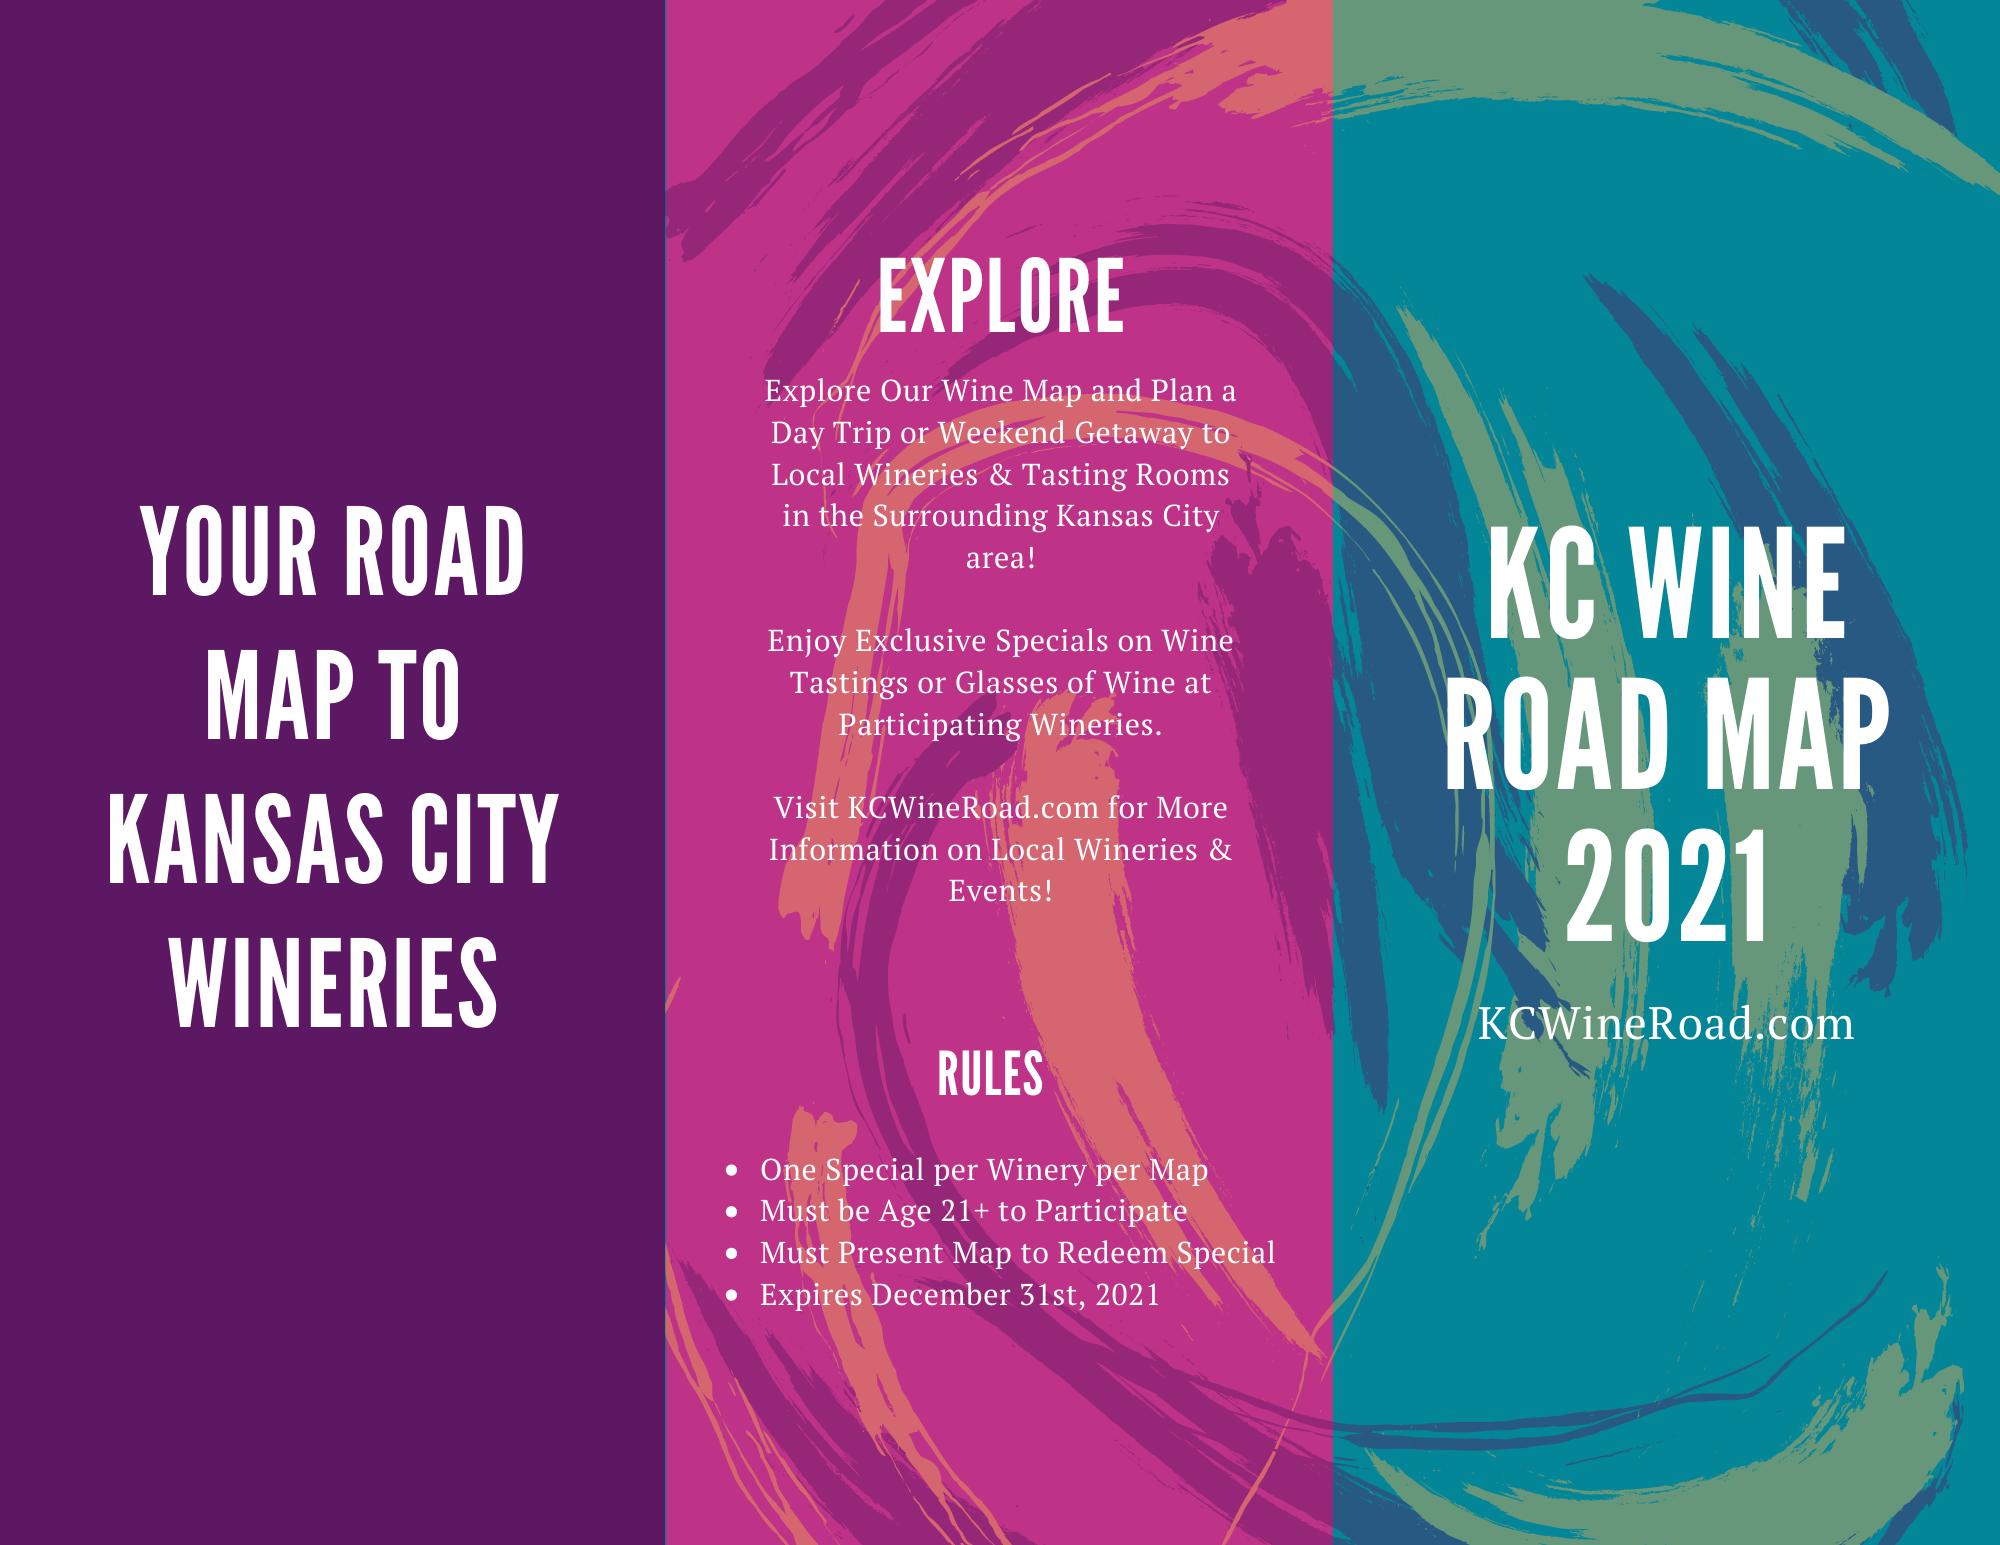 KC Wine Road Map 2020